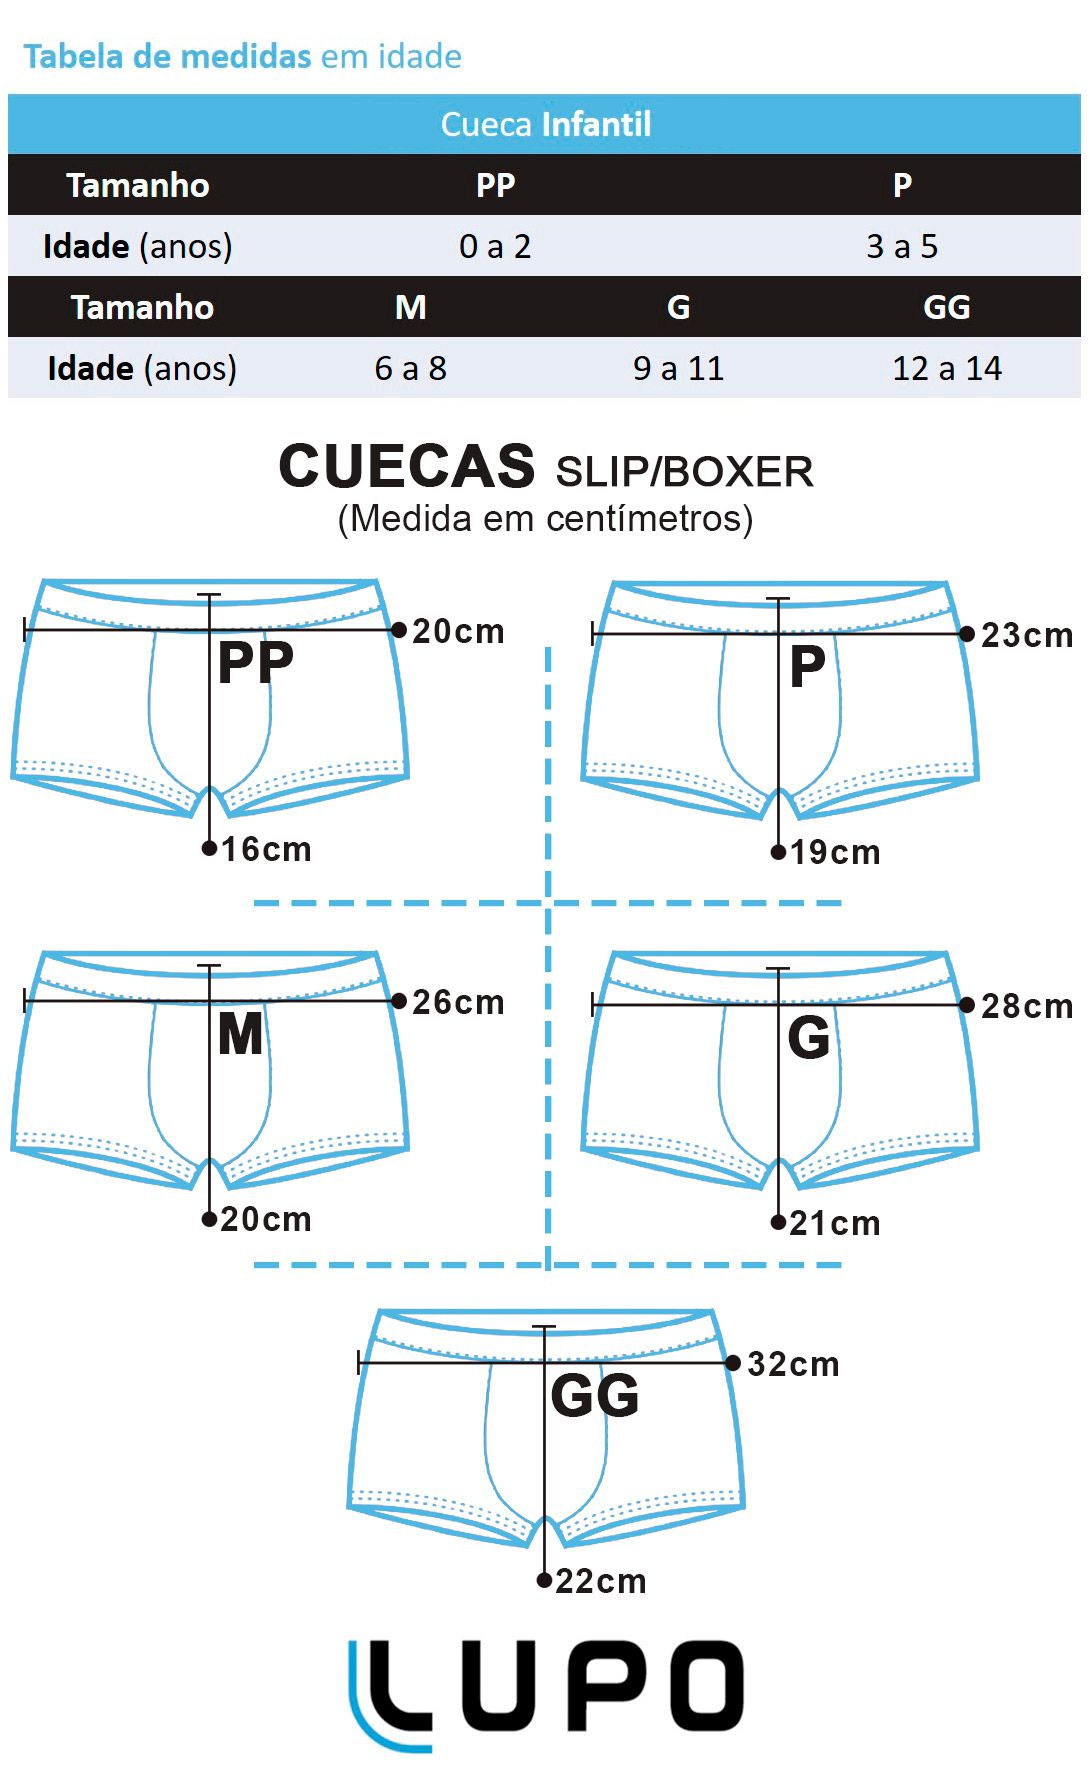 Kit Cueca Infantil Lupo Slip 9 Cuecas Sortidas